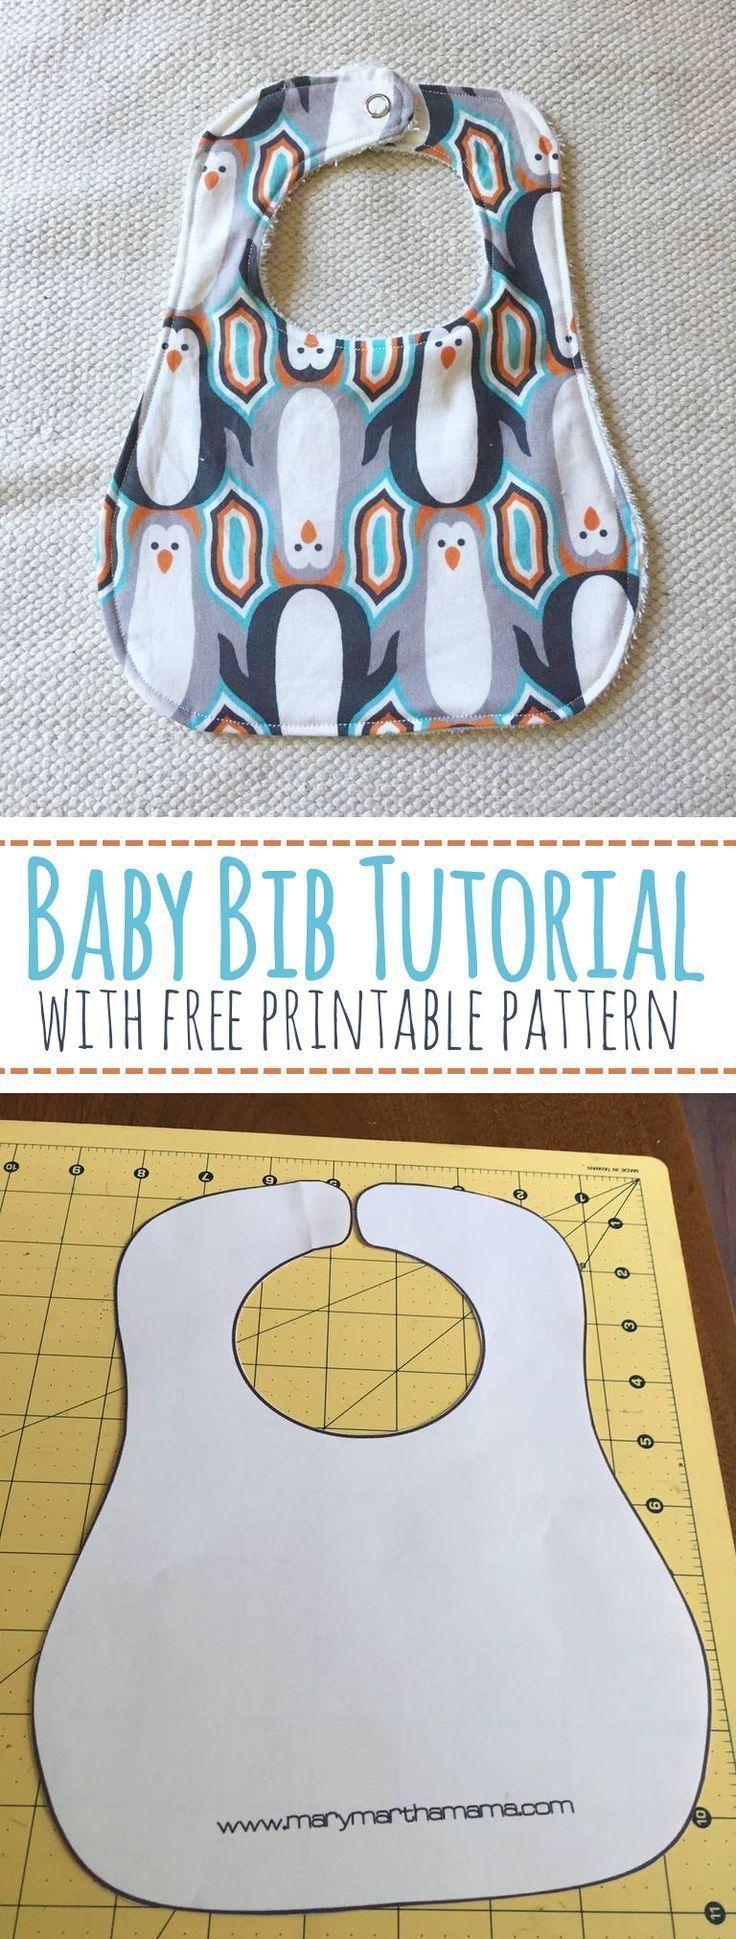 Baby Bib Tutorial with Free Pr